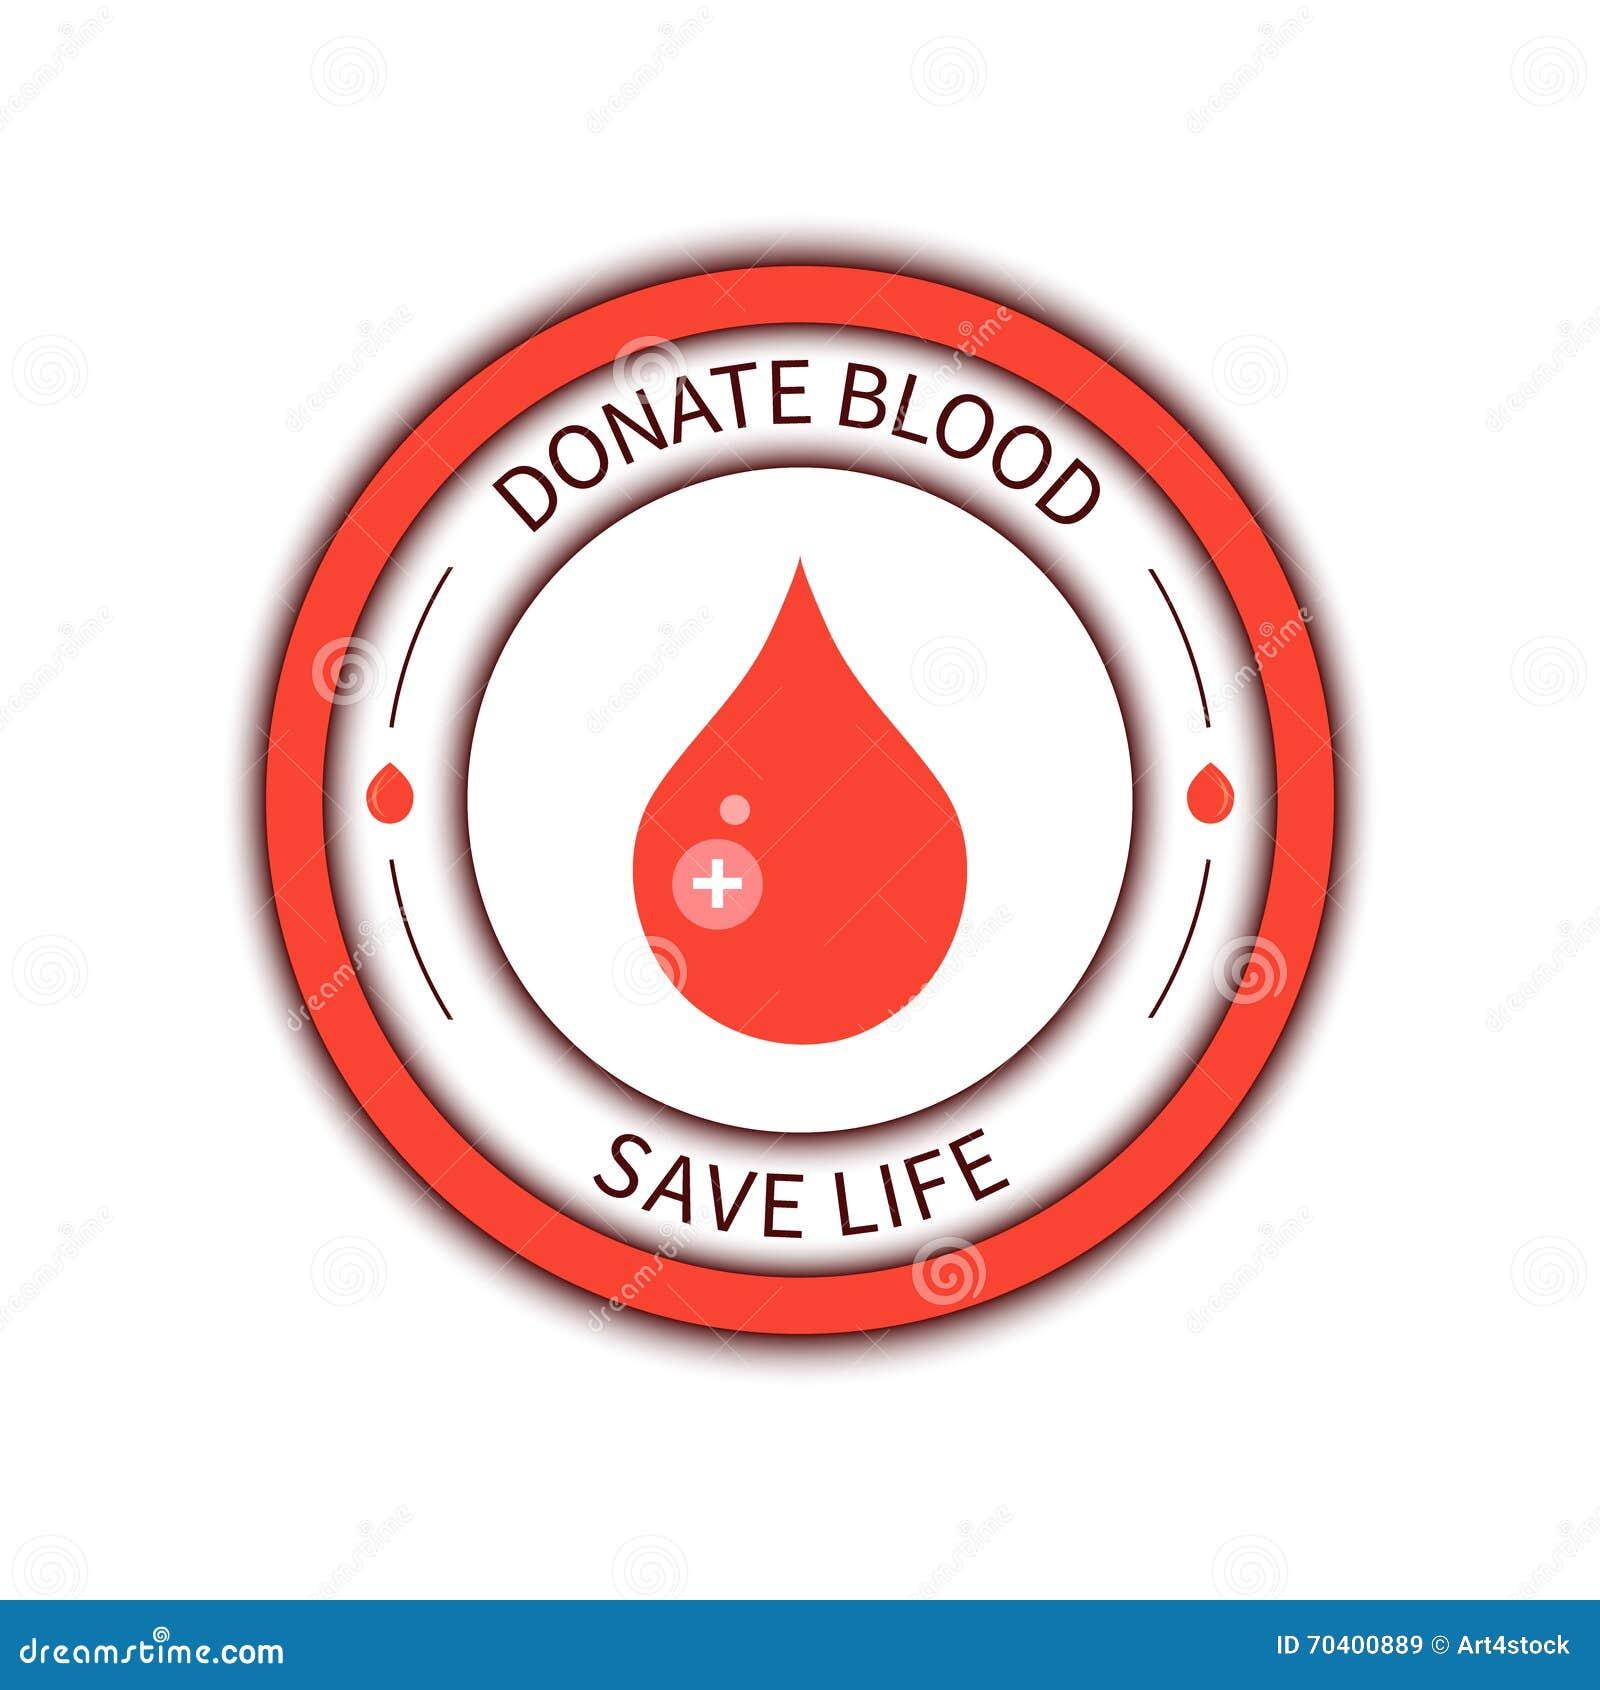 Blood donation poster stock illustration illustration of blood blood donation poster altavistaventures Choice Image